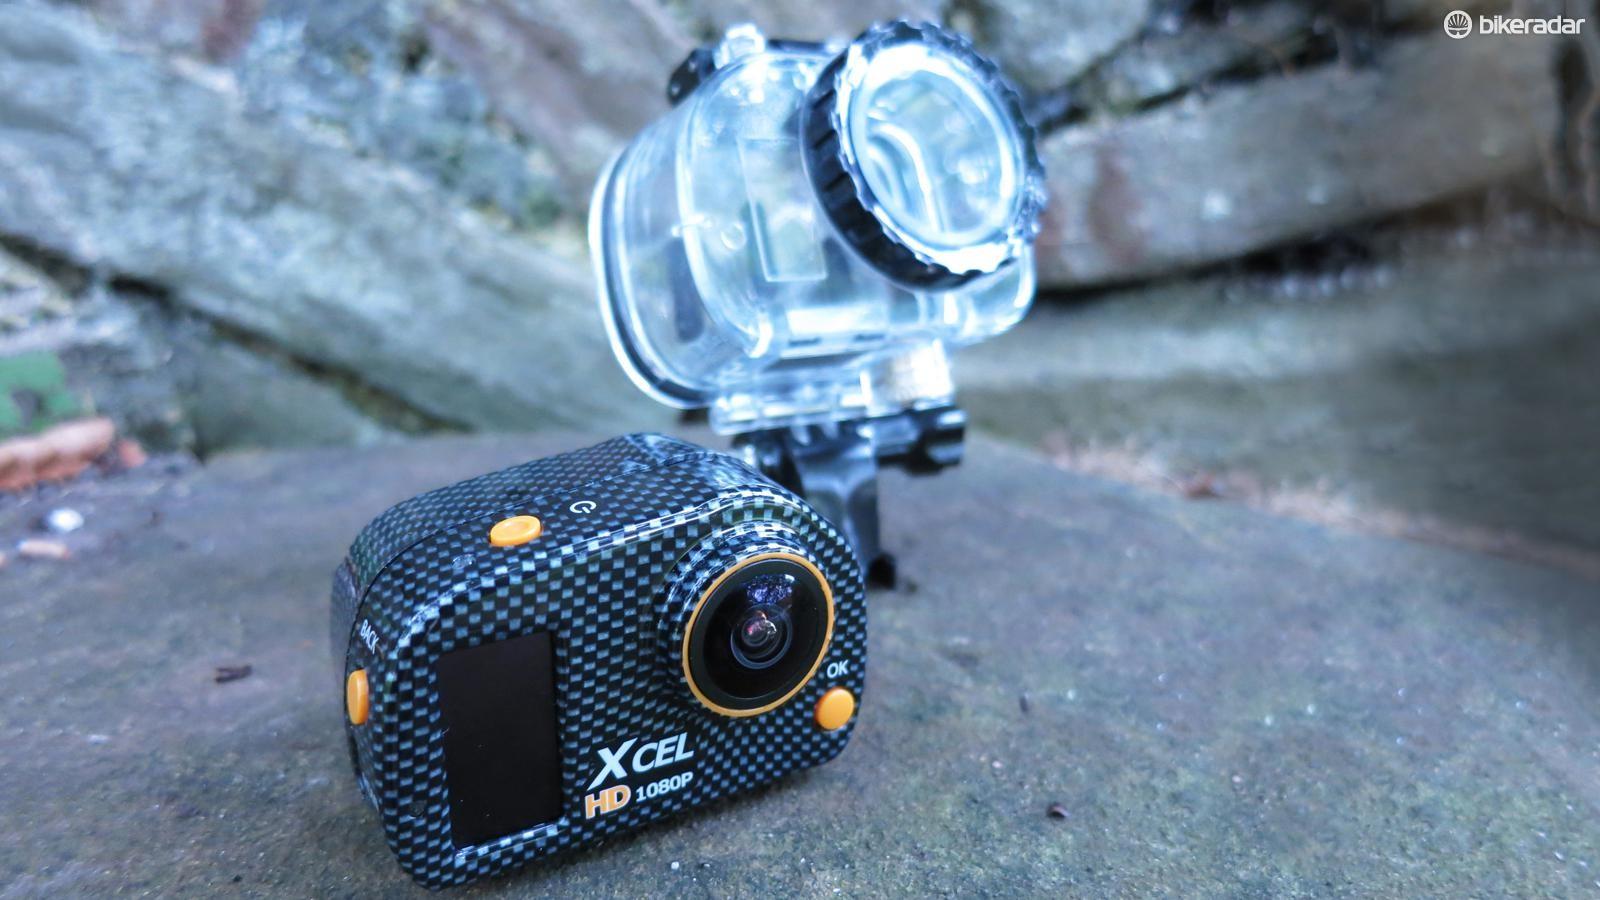 XCEL HD action camera